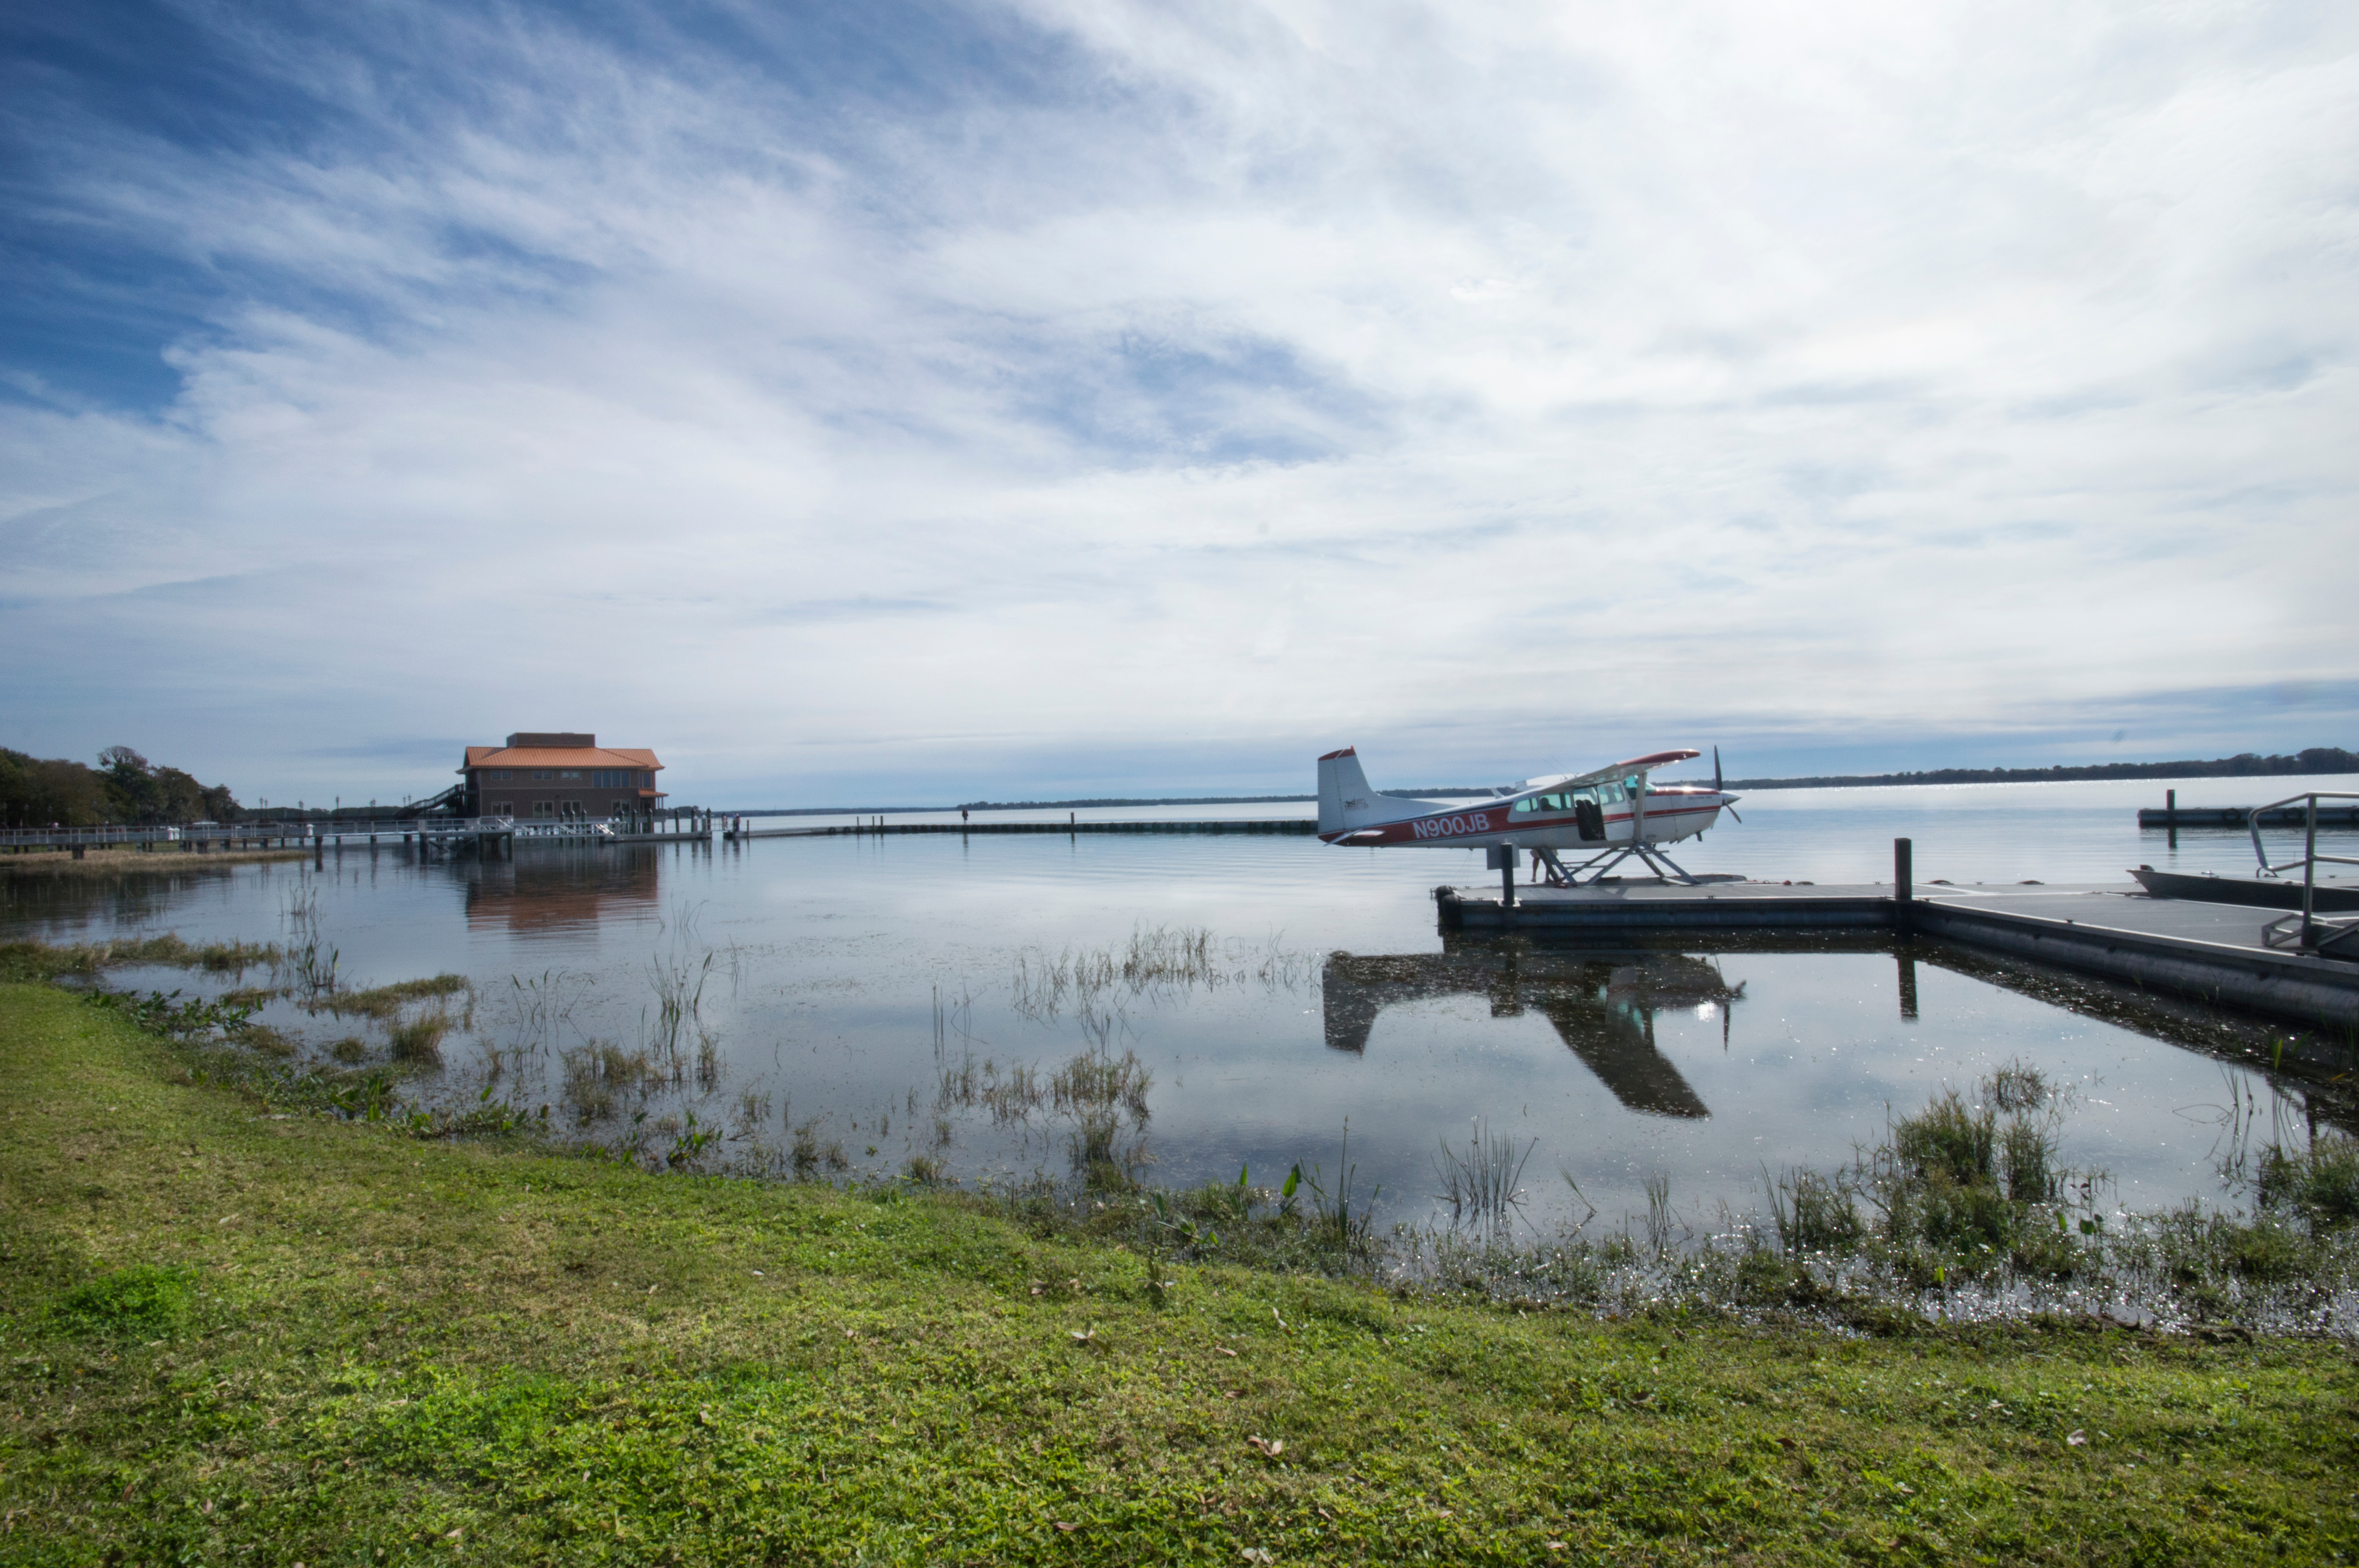 Seaplane and Pavillion